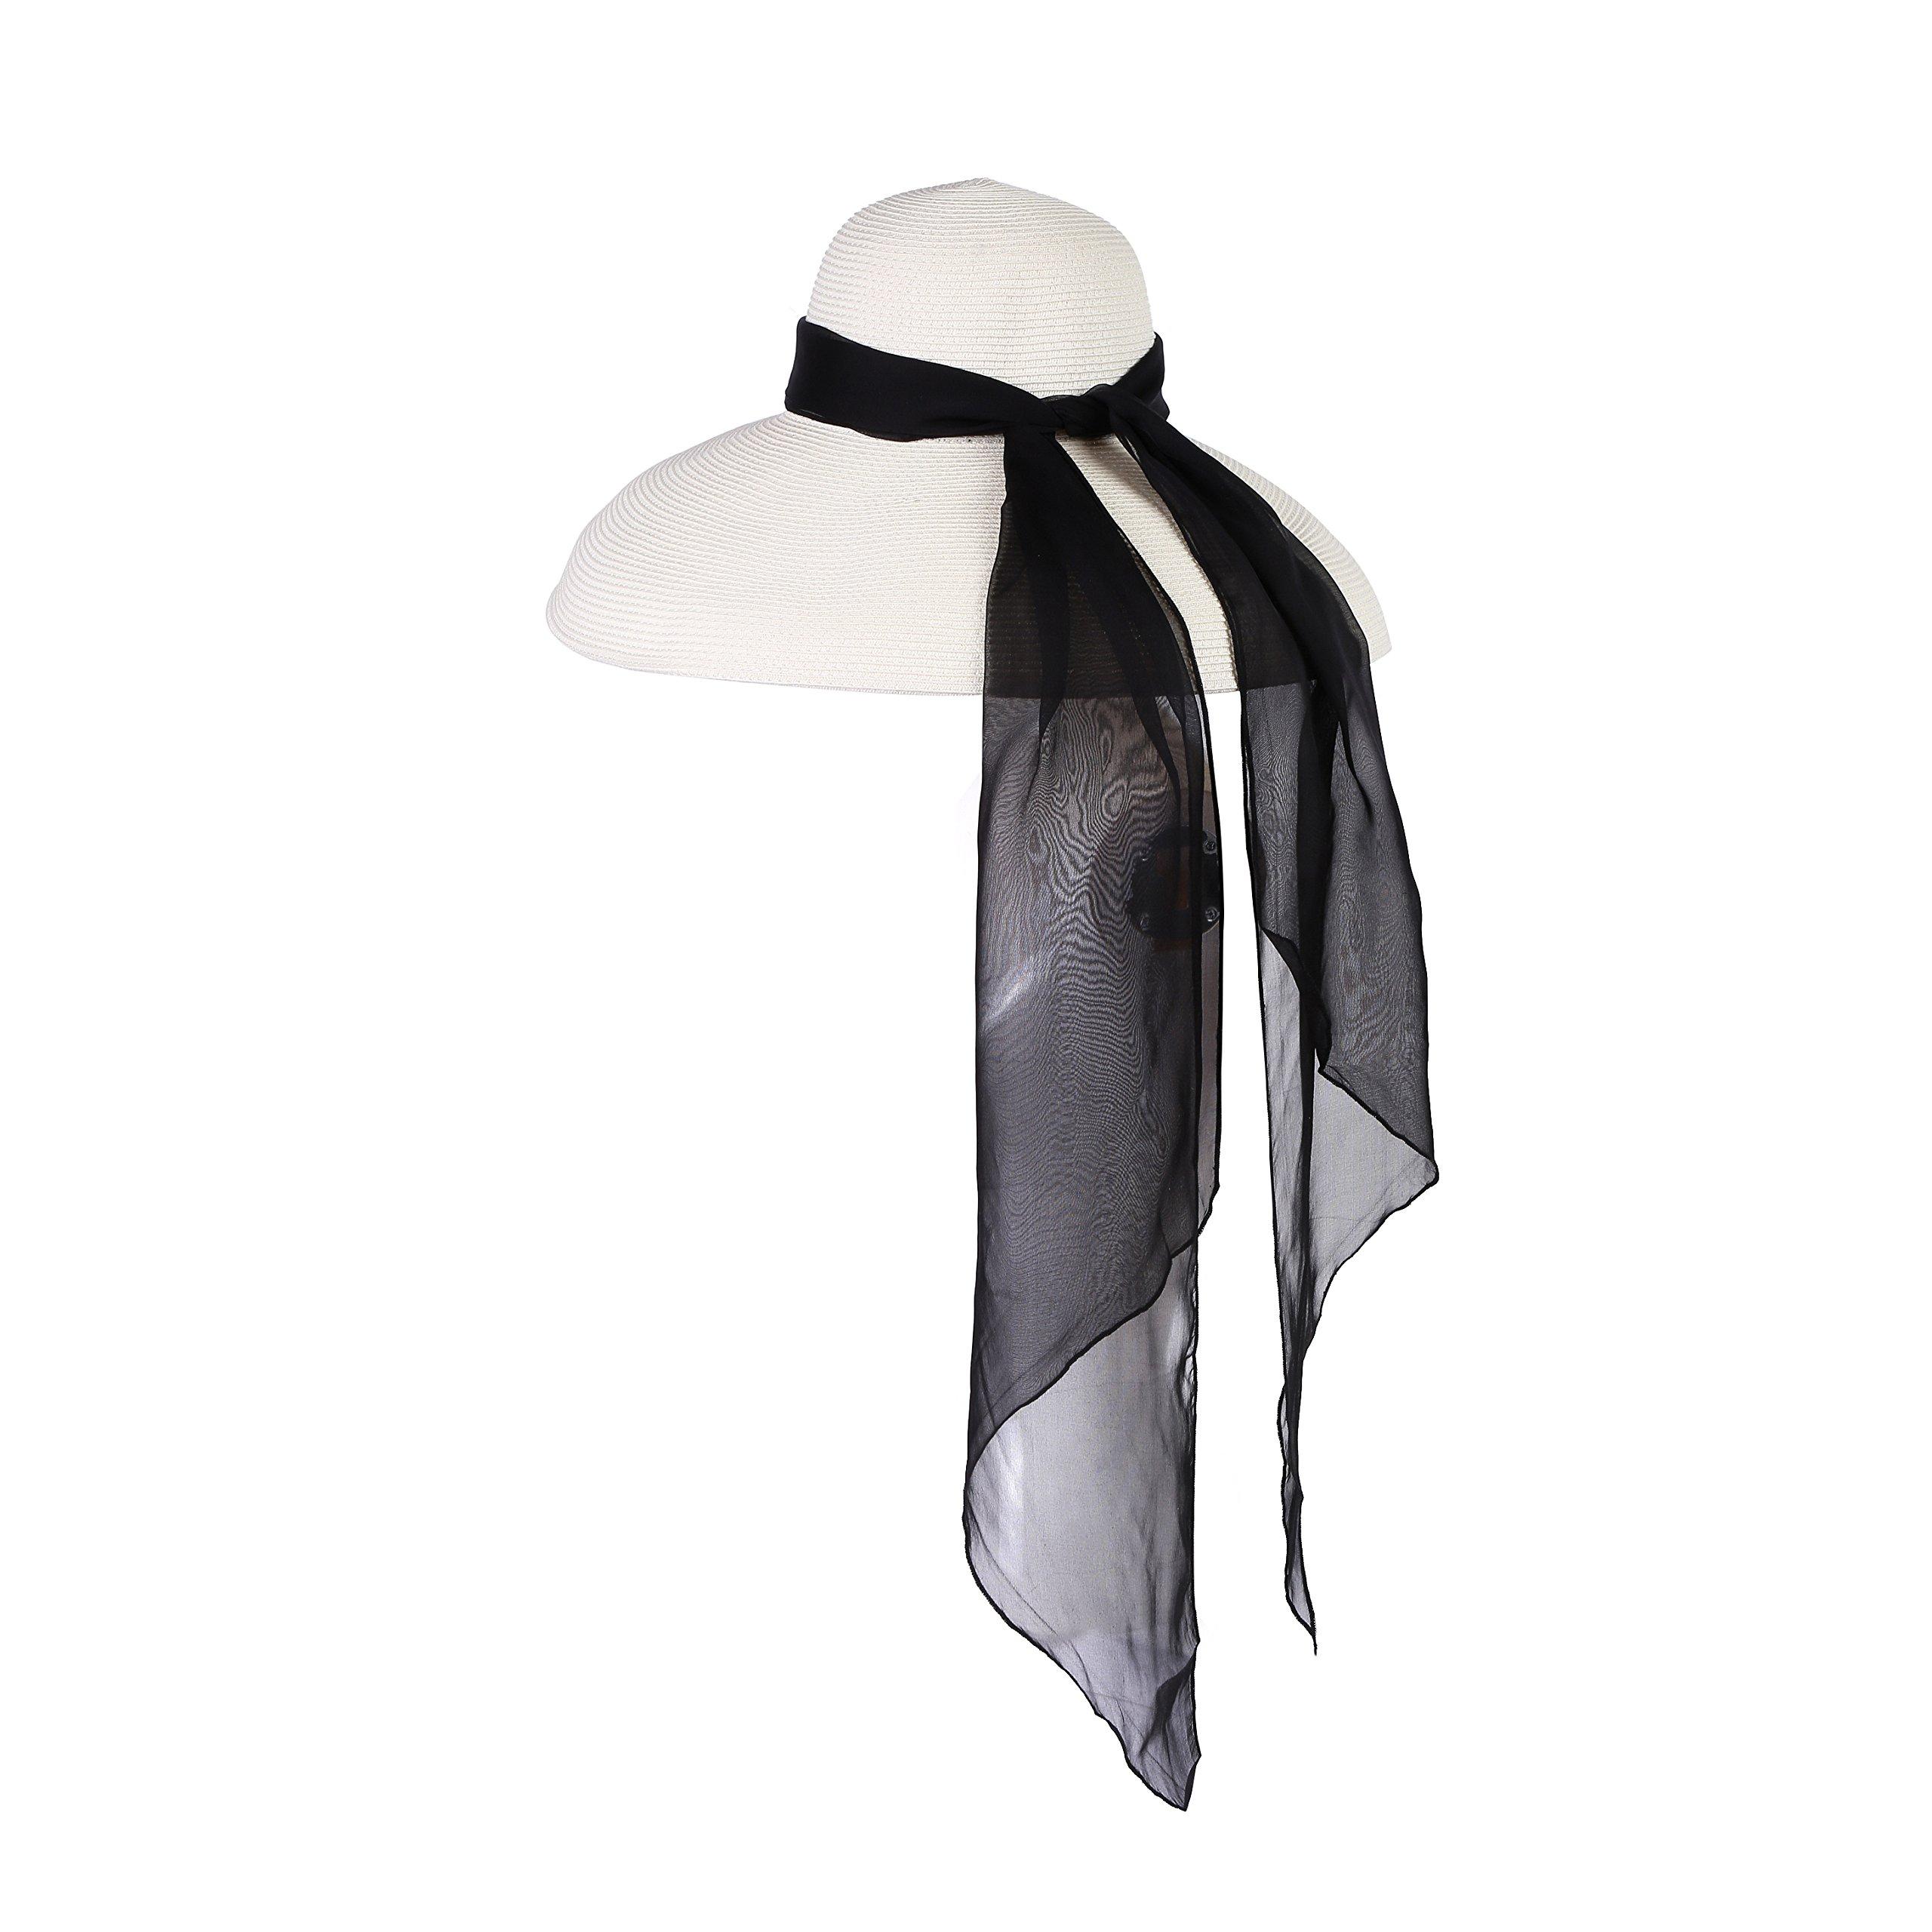 Utopiat Audrey Hepburn Oversized Holiday Travel Beach Straw Hat With Silk Chiffon Scarf In Midnight Black